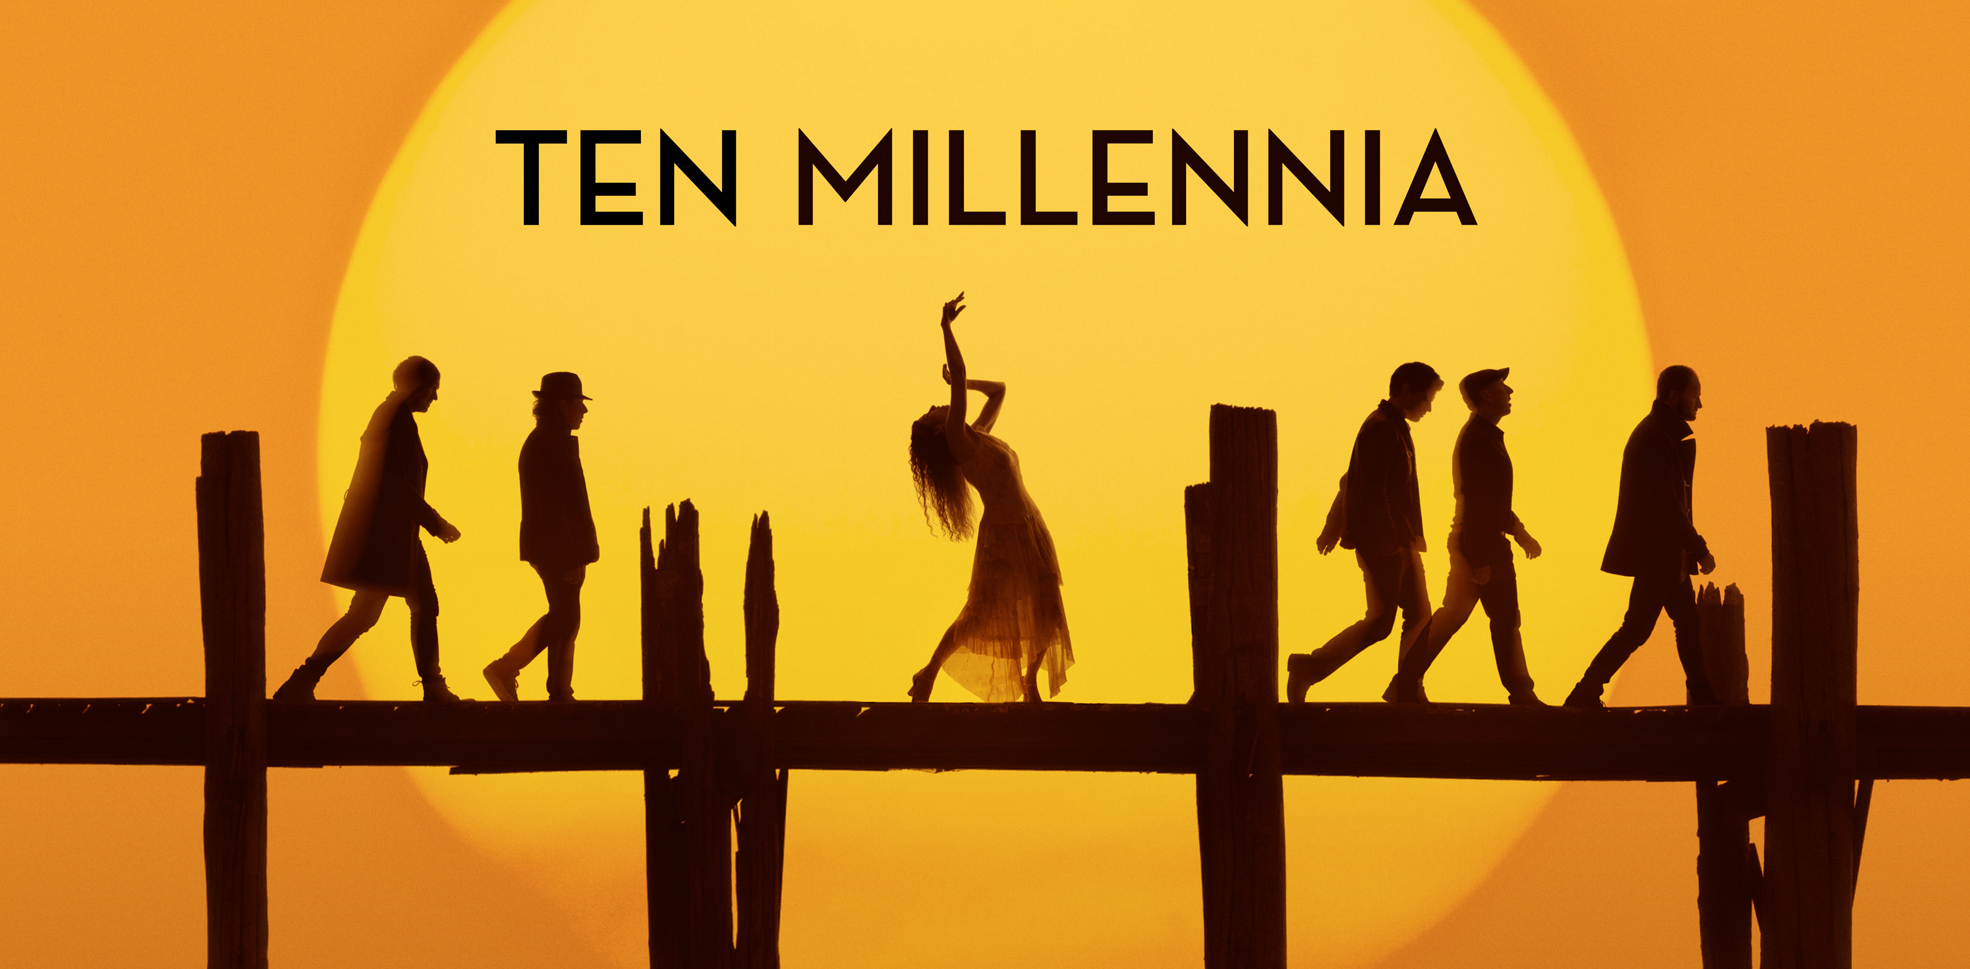 10 Millennia